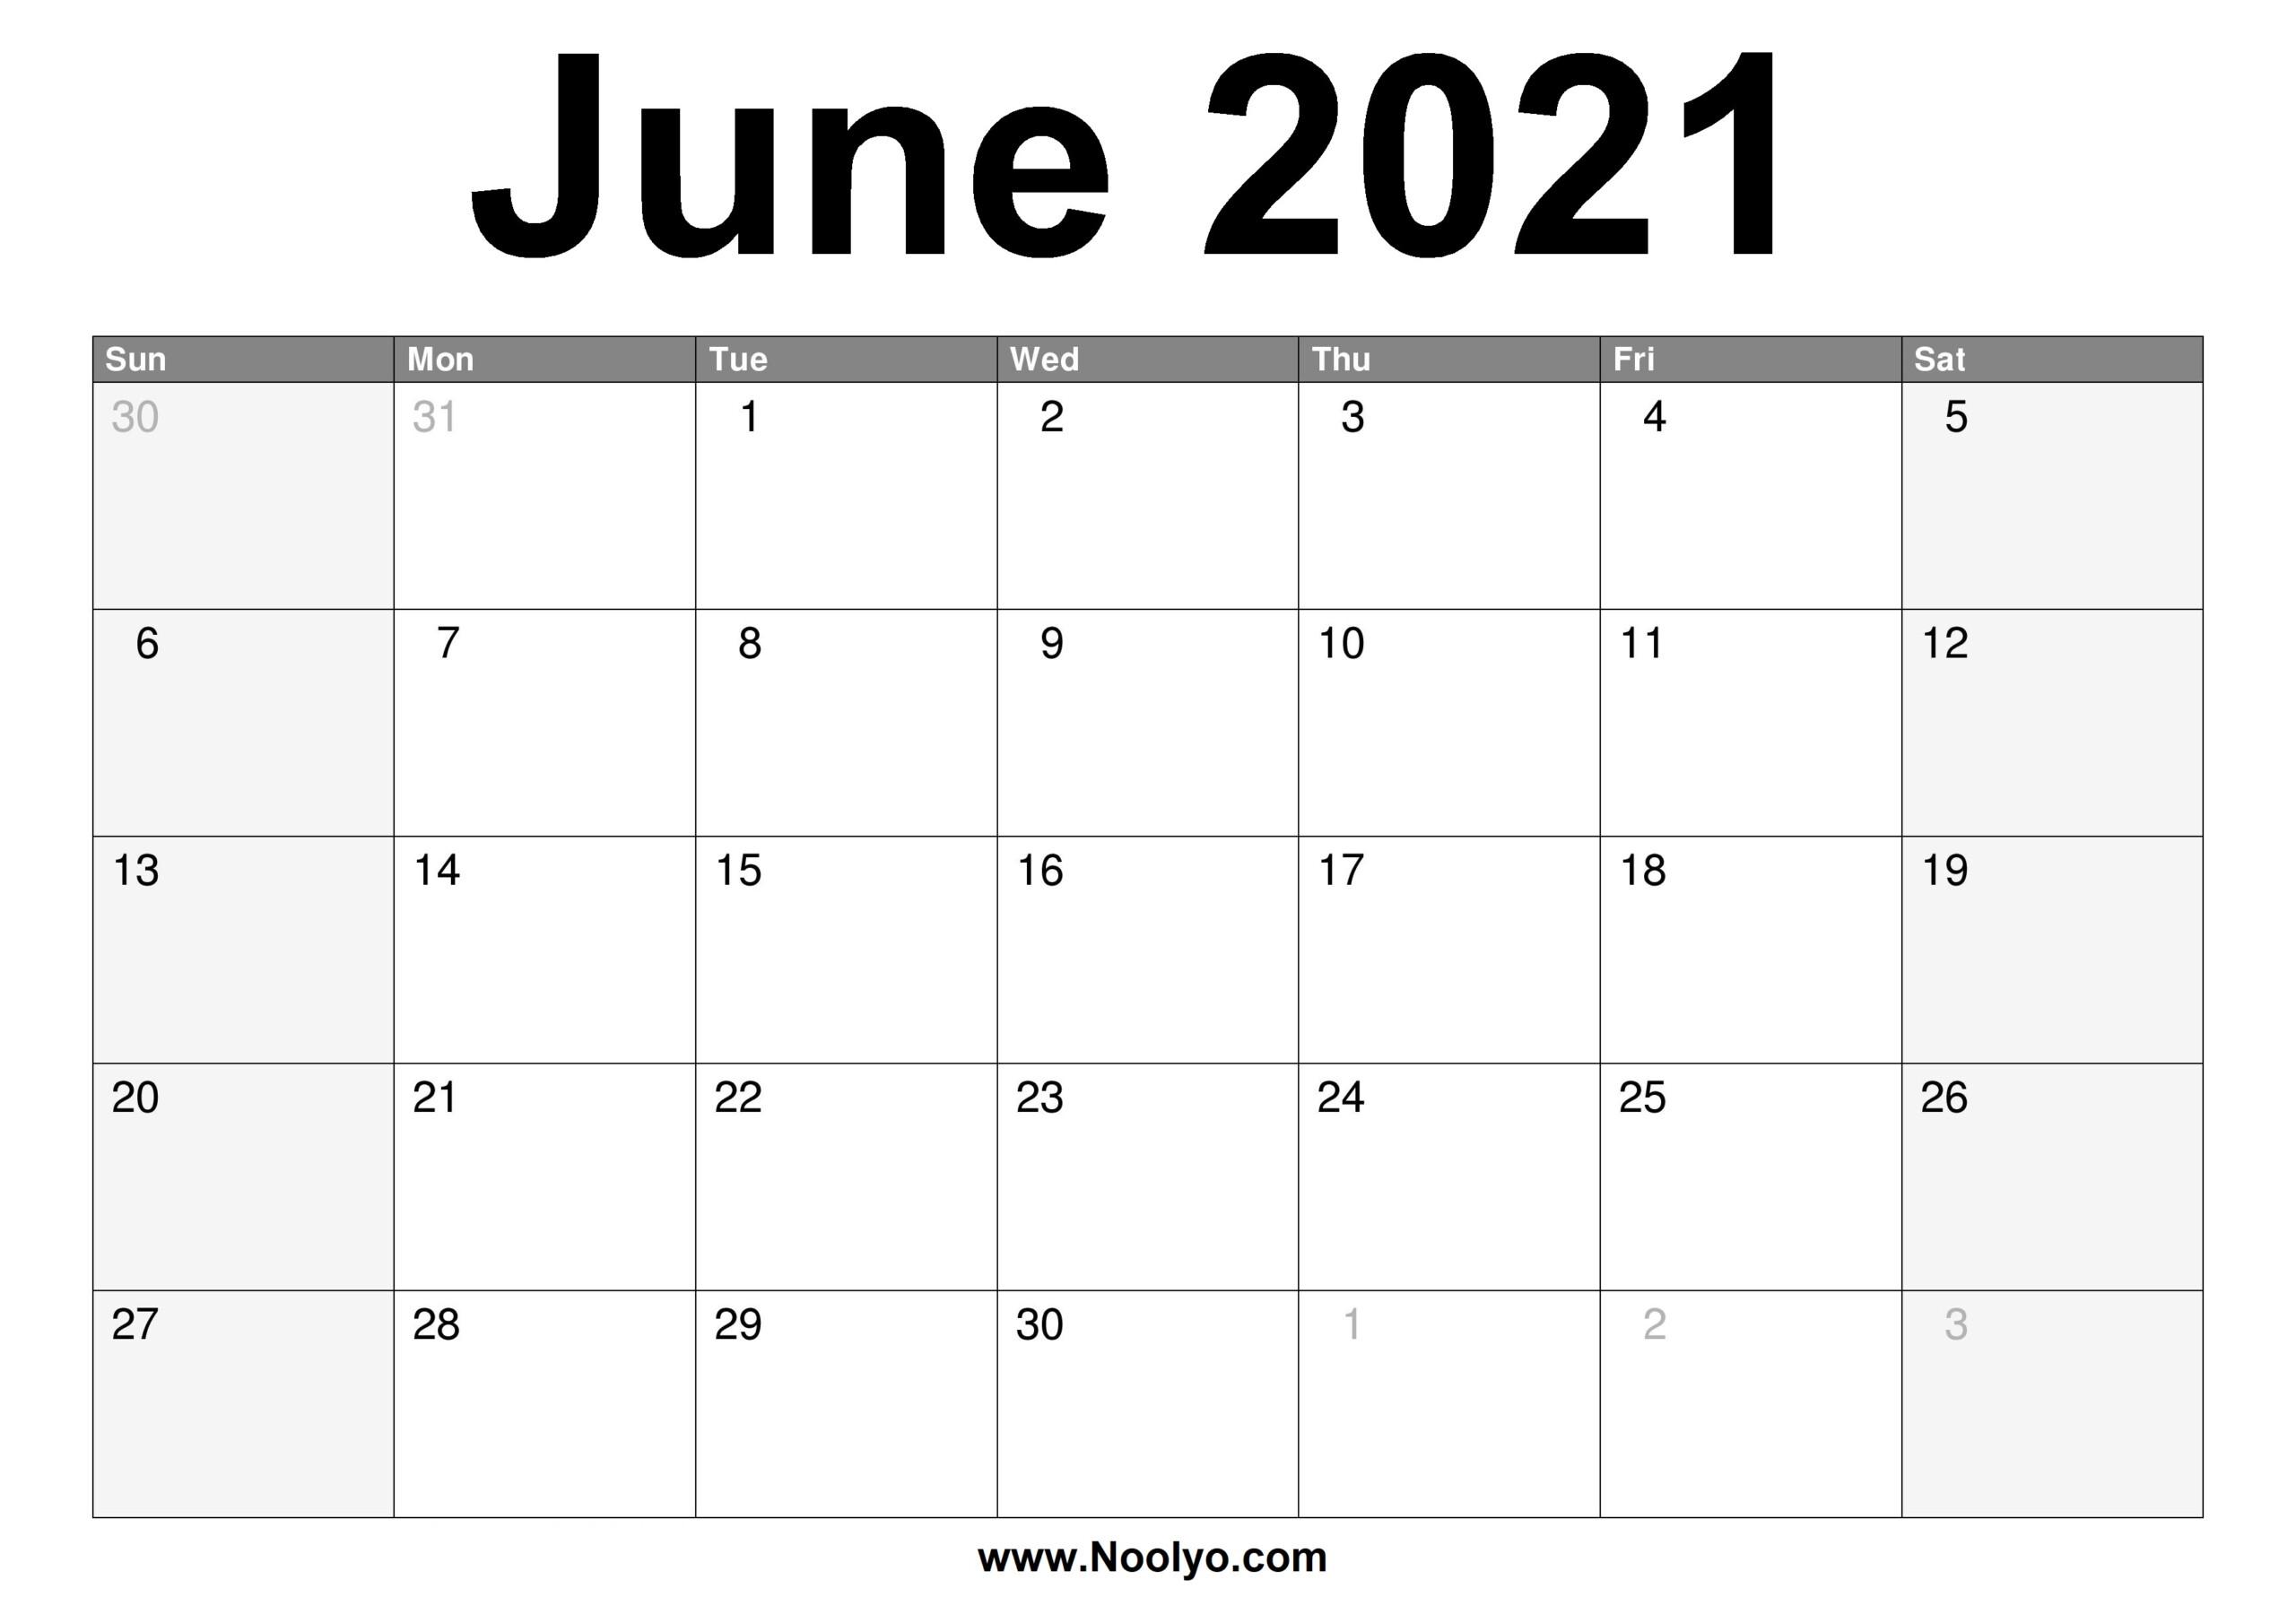 Calendar June 2021 | Printable Calendars 2021